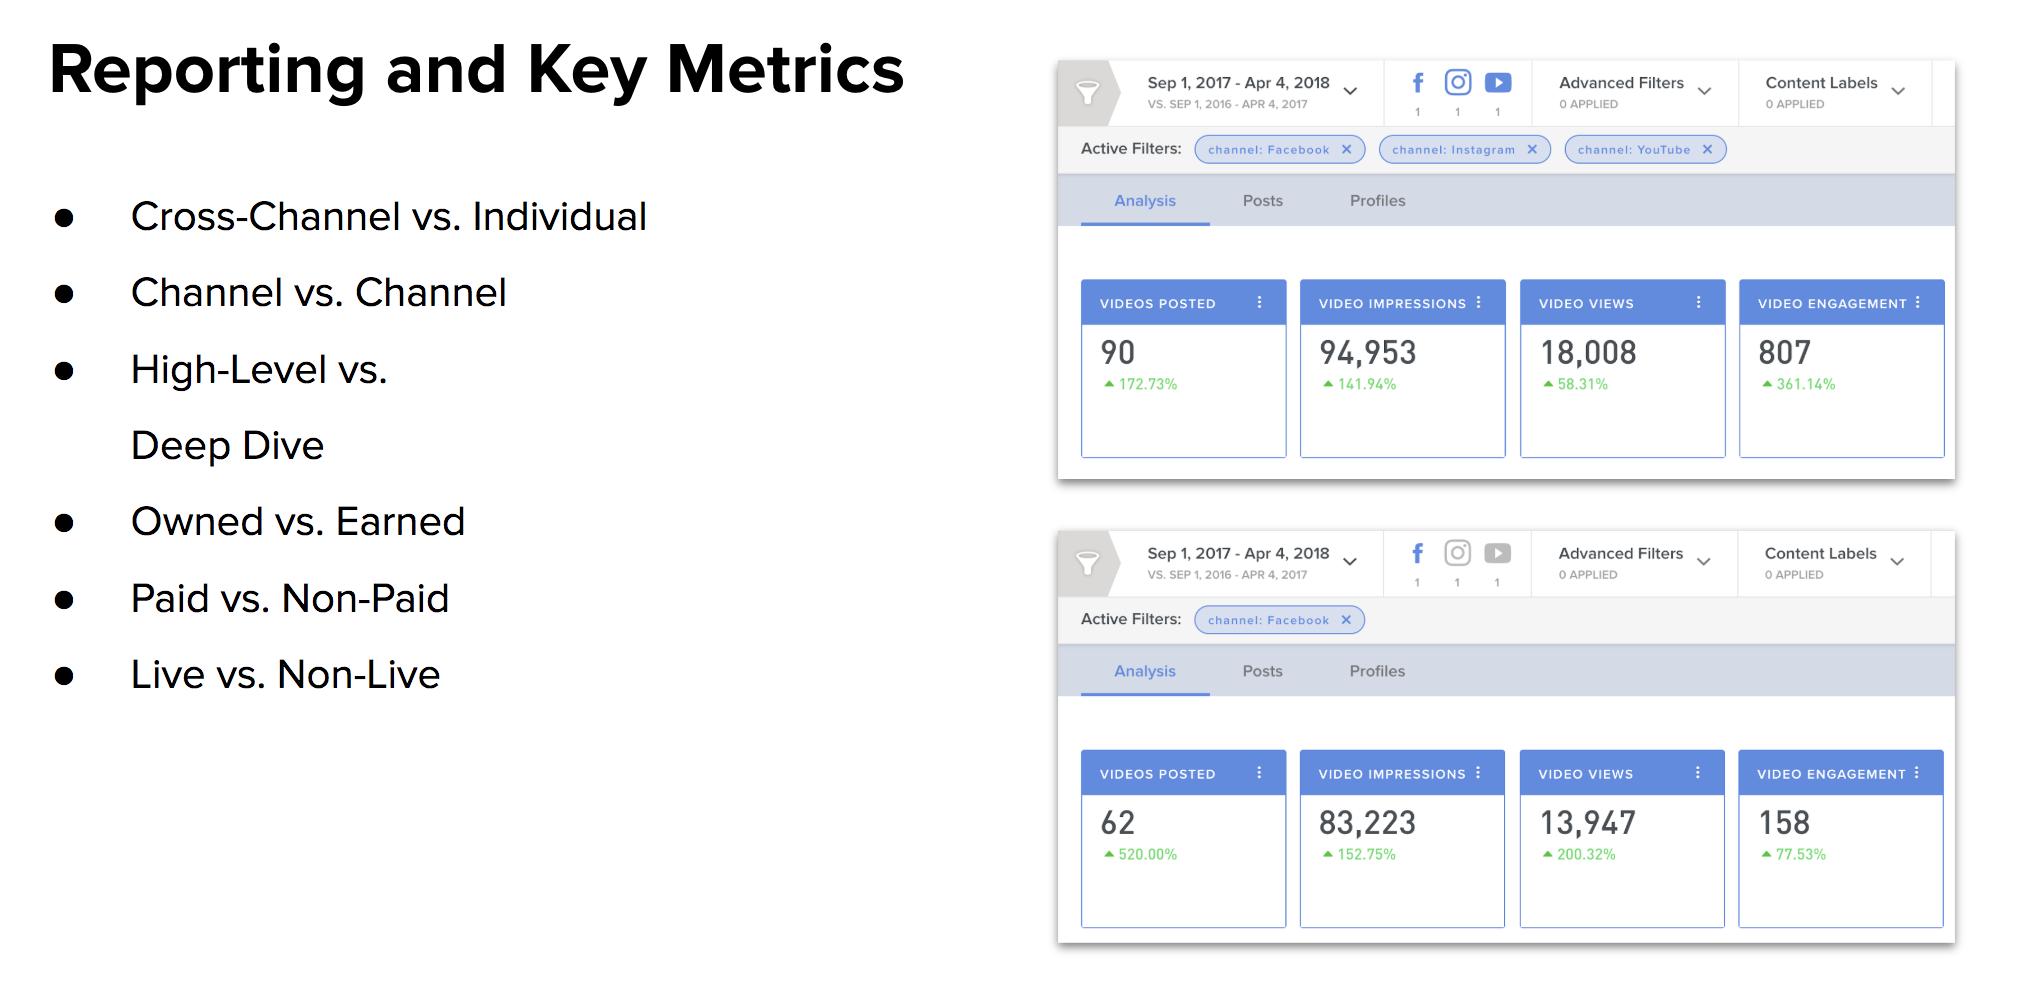 Reporting Key Metrics